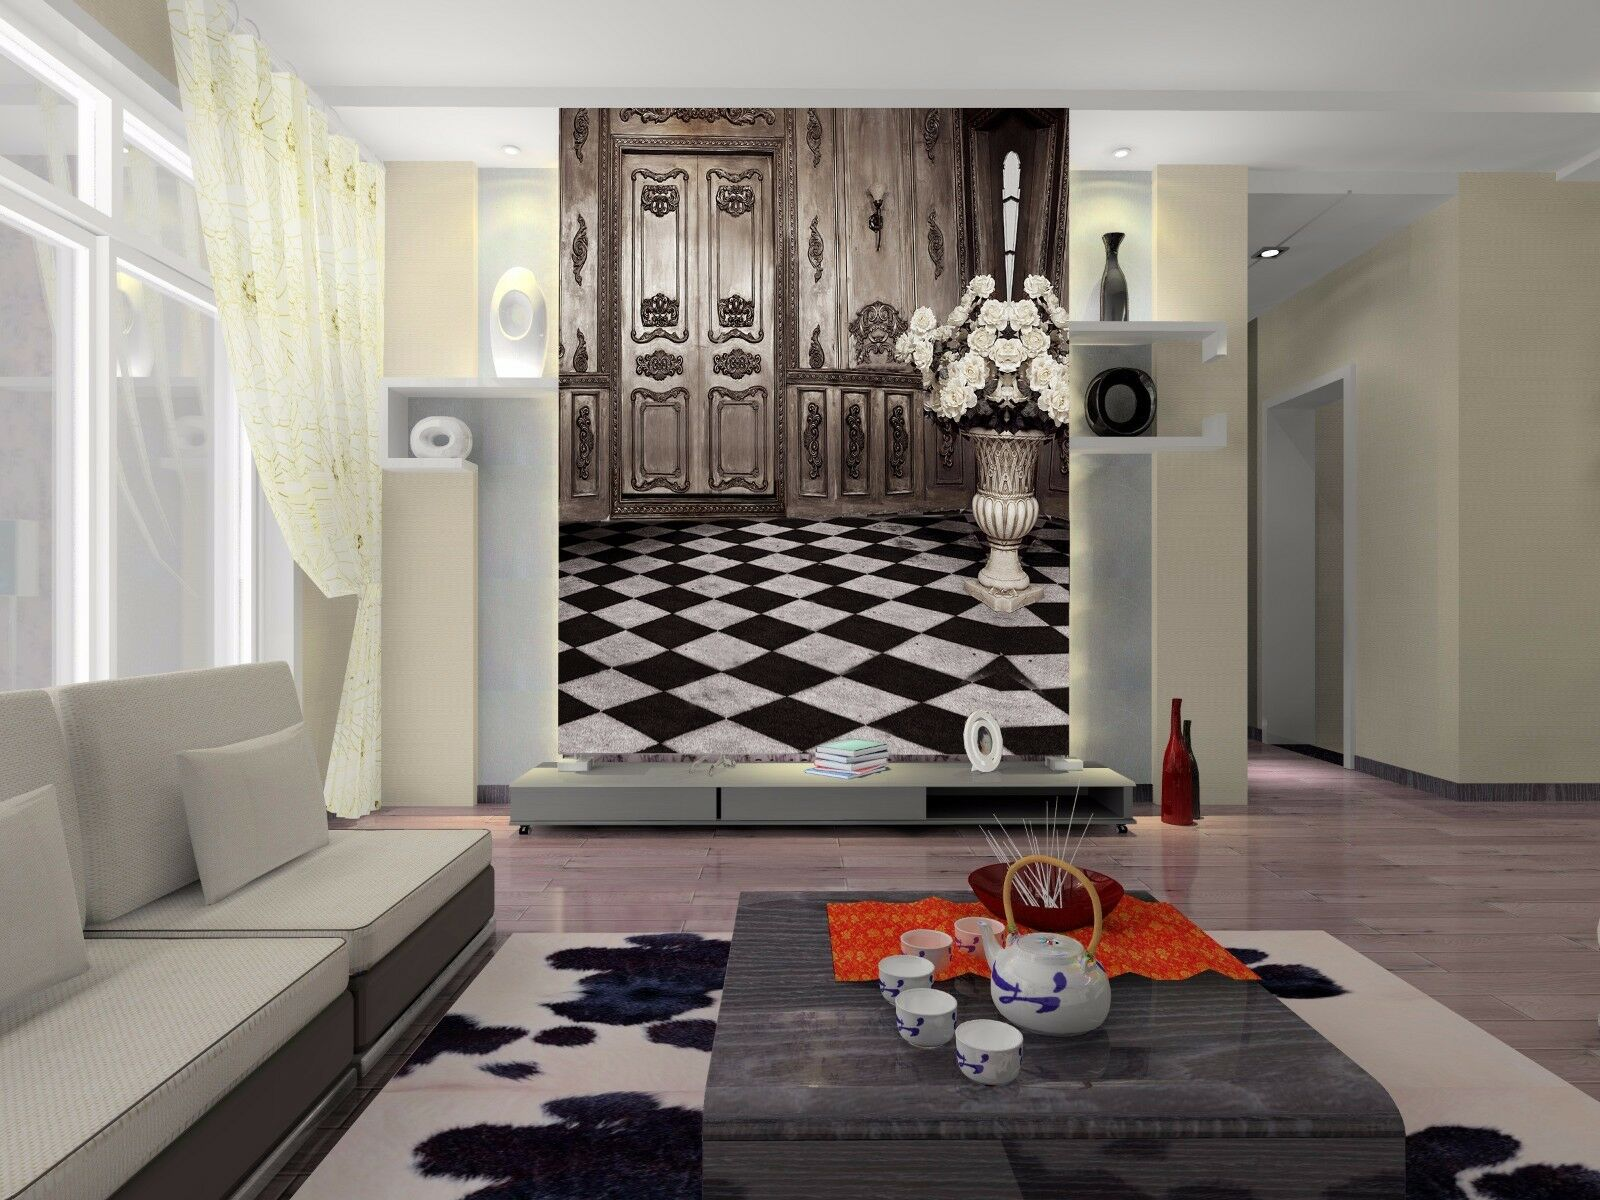 3D Room Adorn 4052 Wallpaper Murals Wall Print Wall Mural AJ WALLPAPER UK Lemon